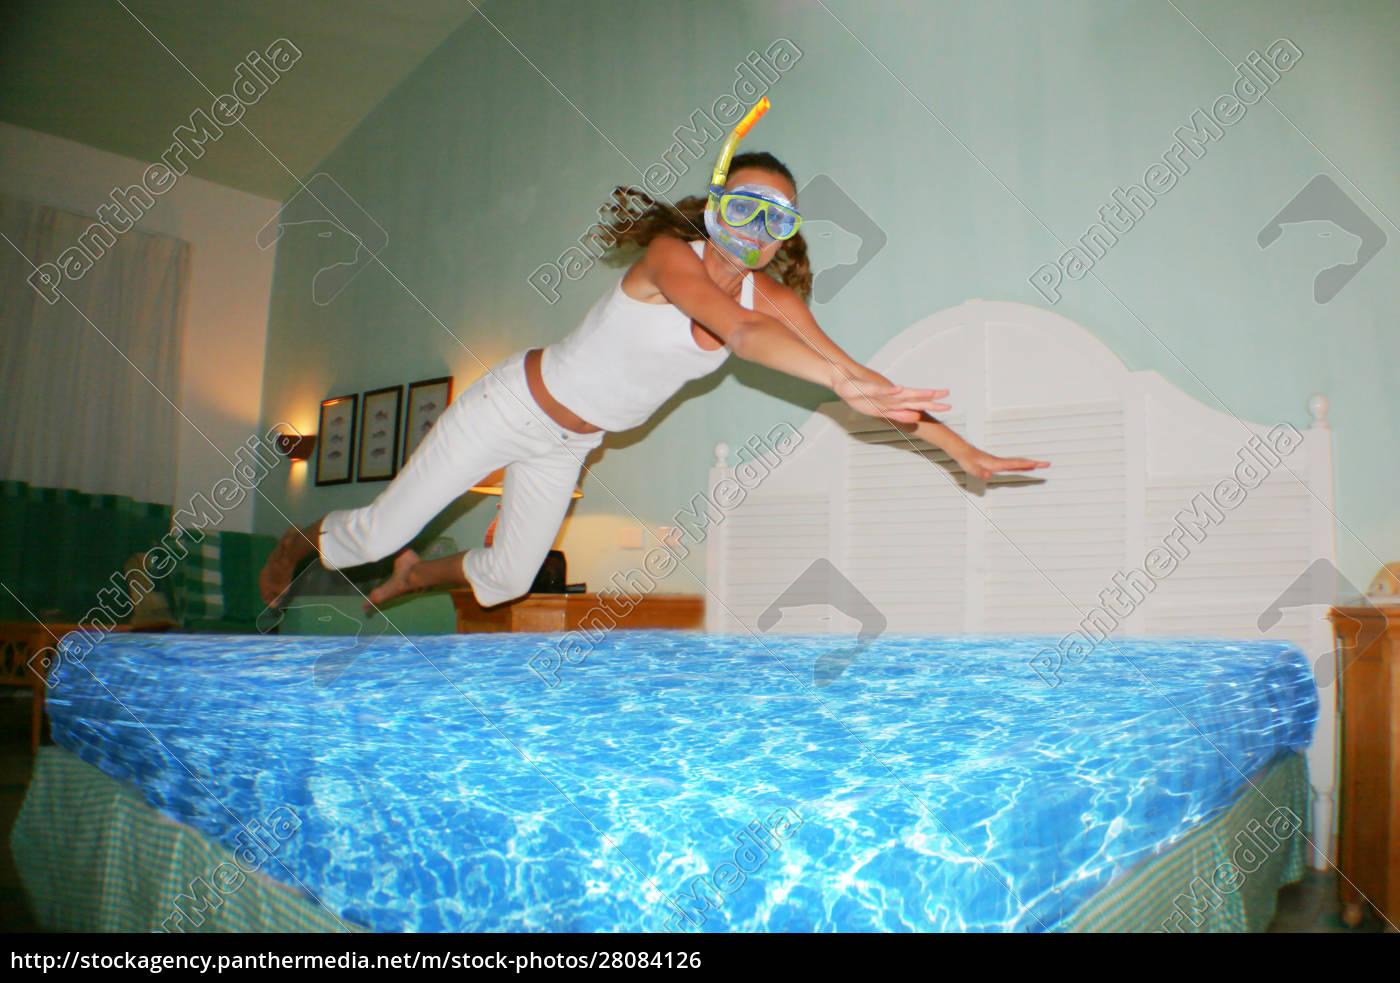 snorkel, at, home - 28084126